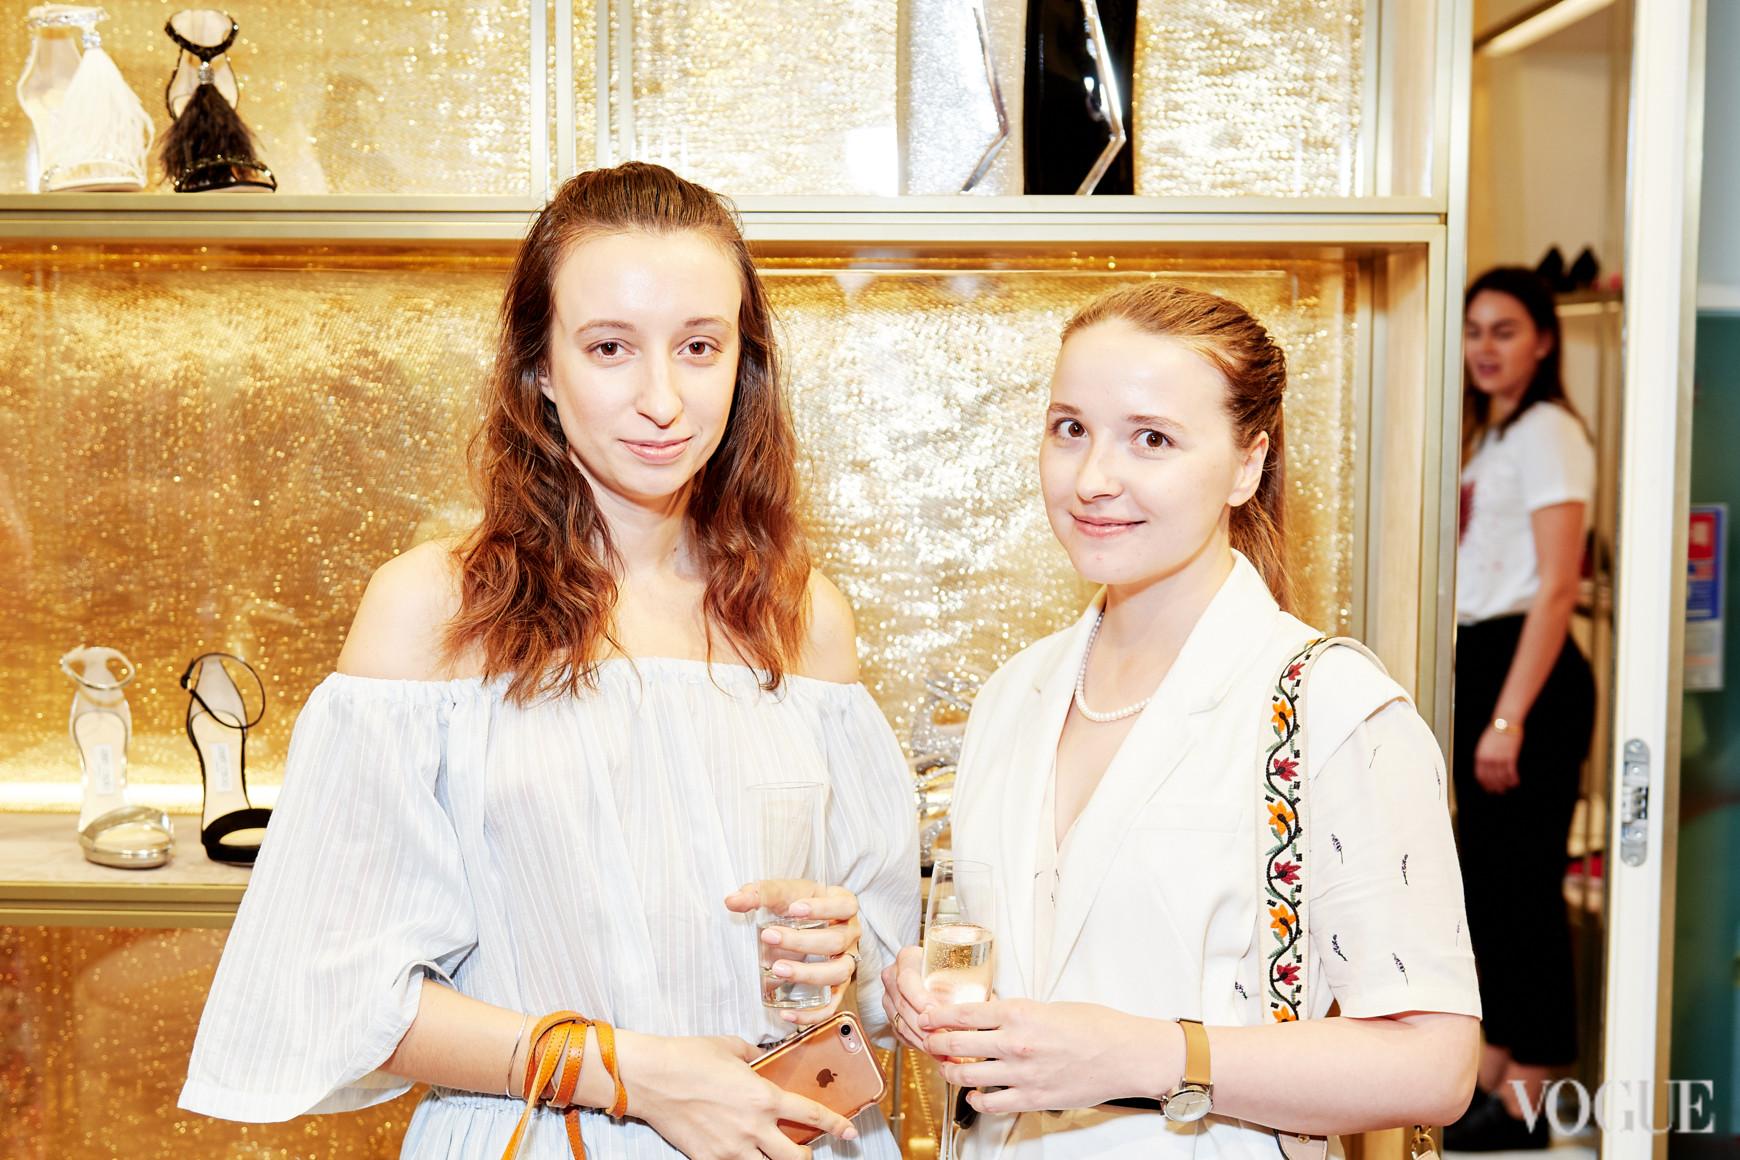 Марія Мохова і Діана Мельникова